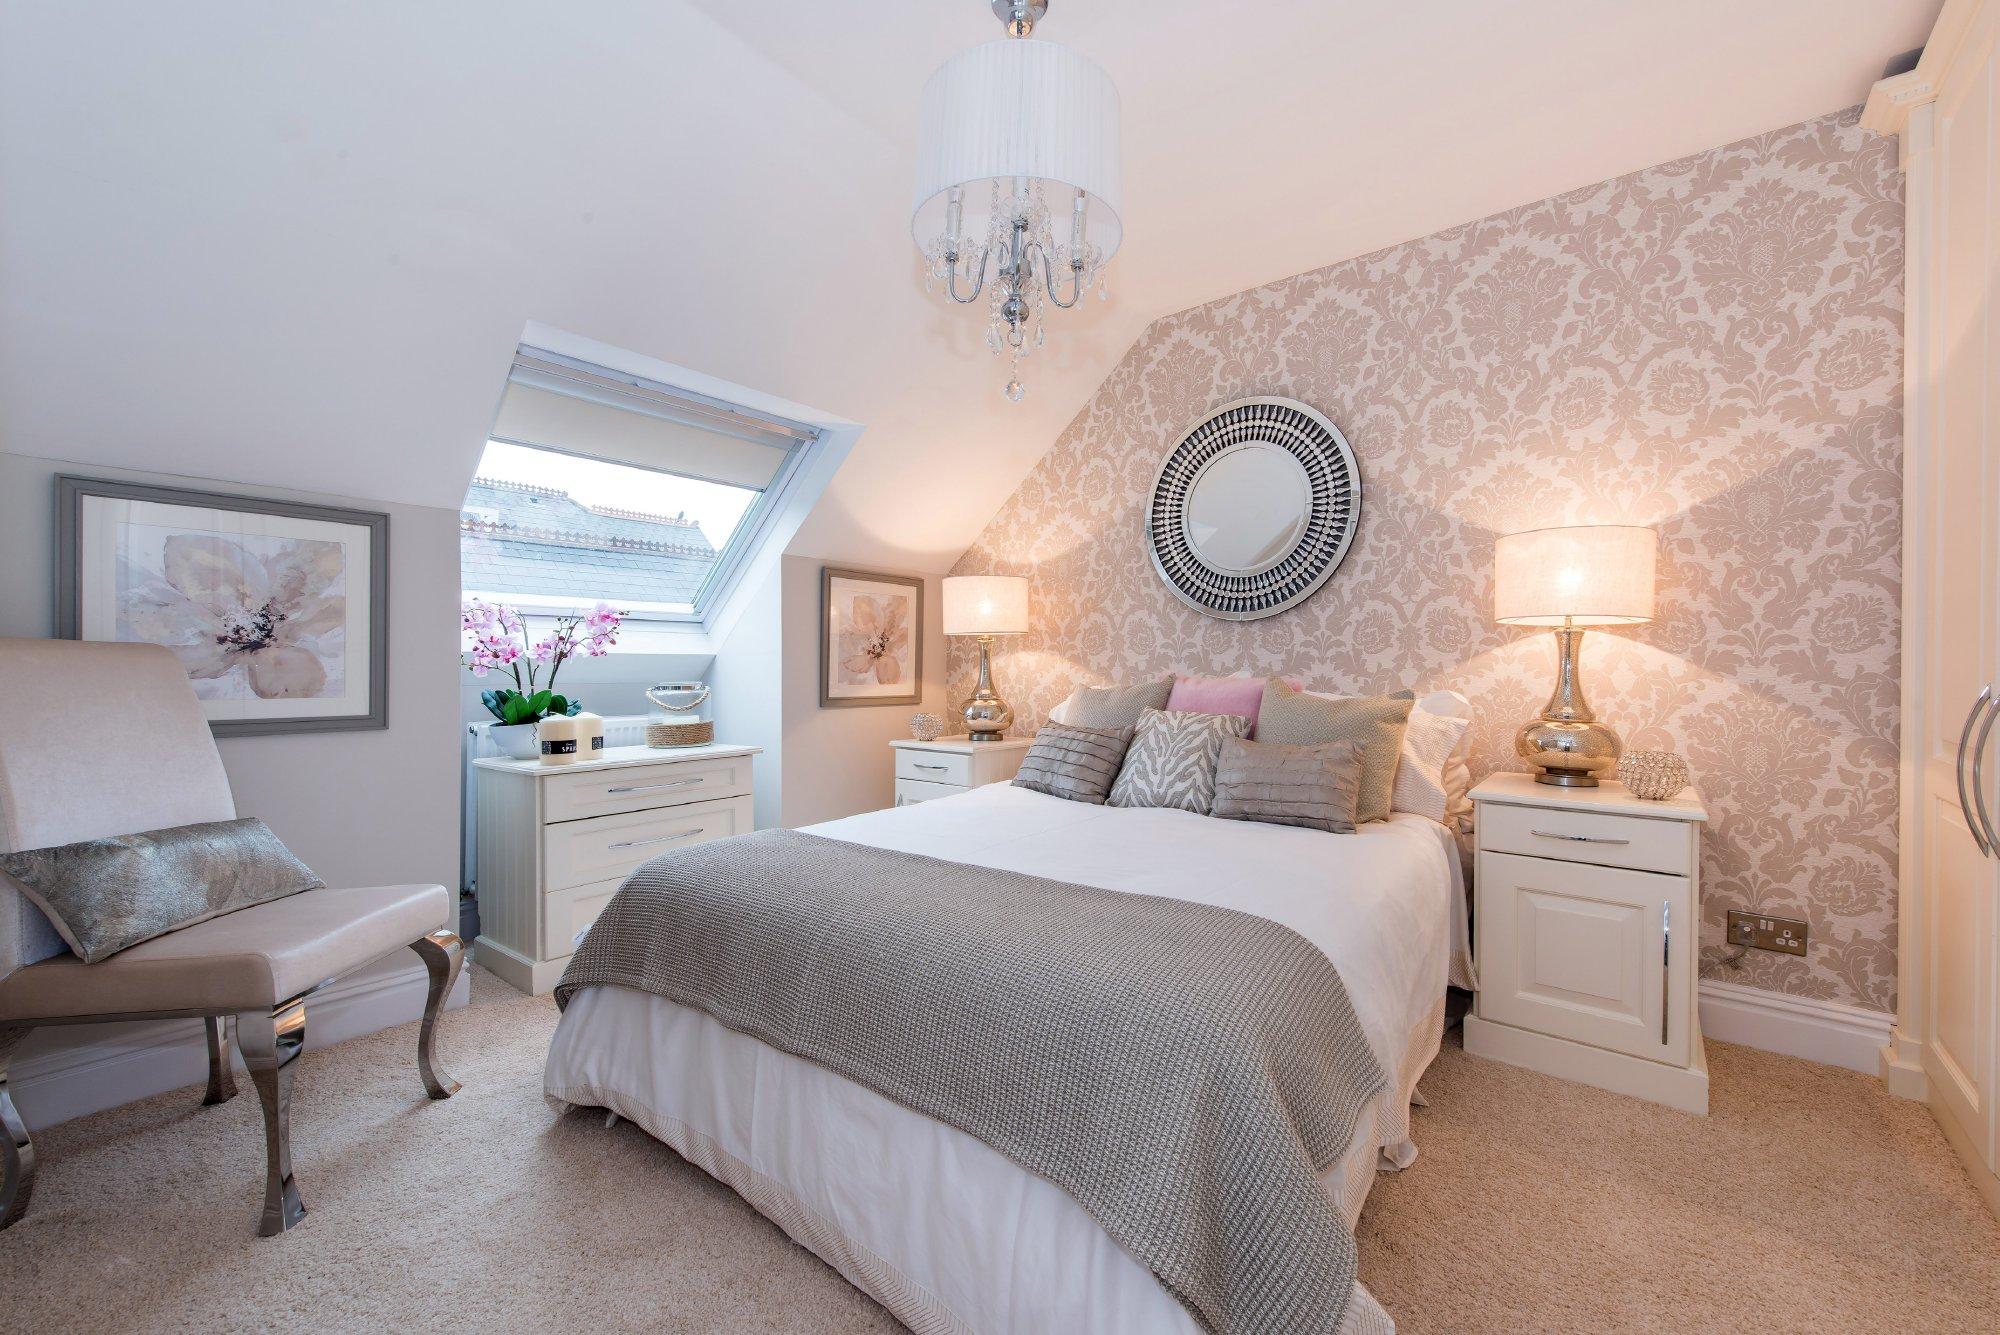 Whiteoak,Secondary Bedroom